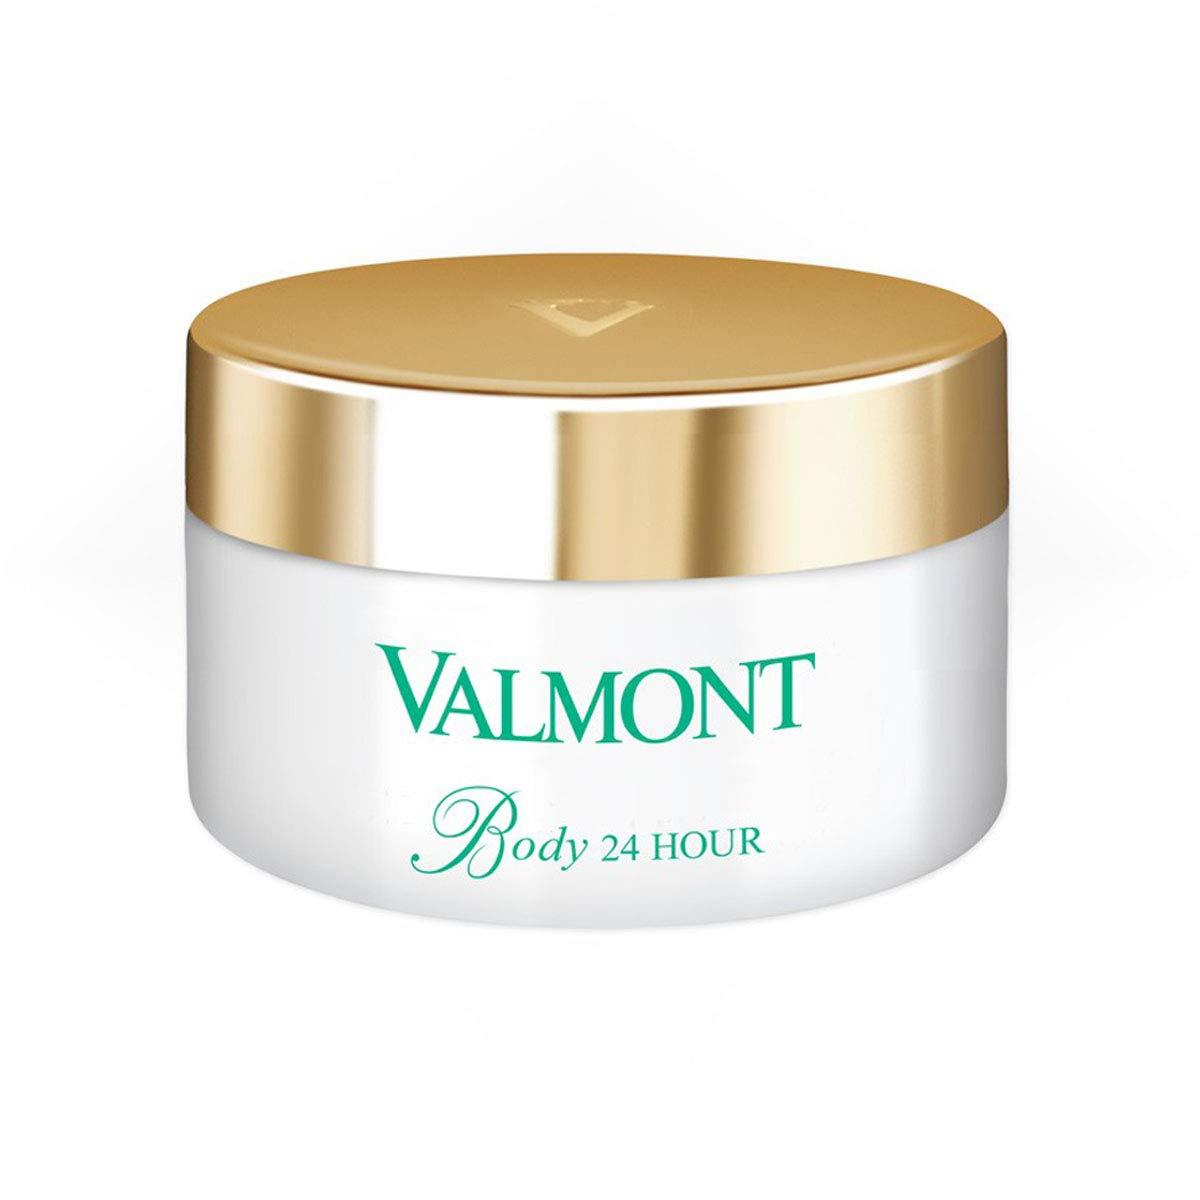 Valmont Body 24 Hour 200 mL